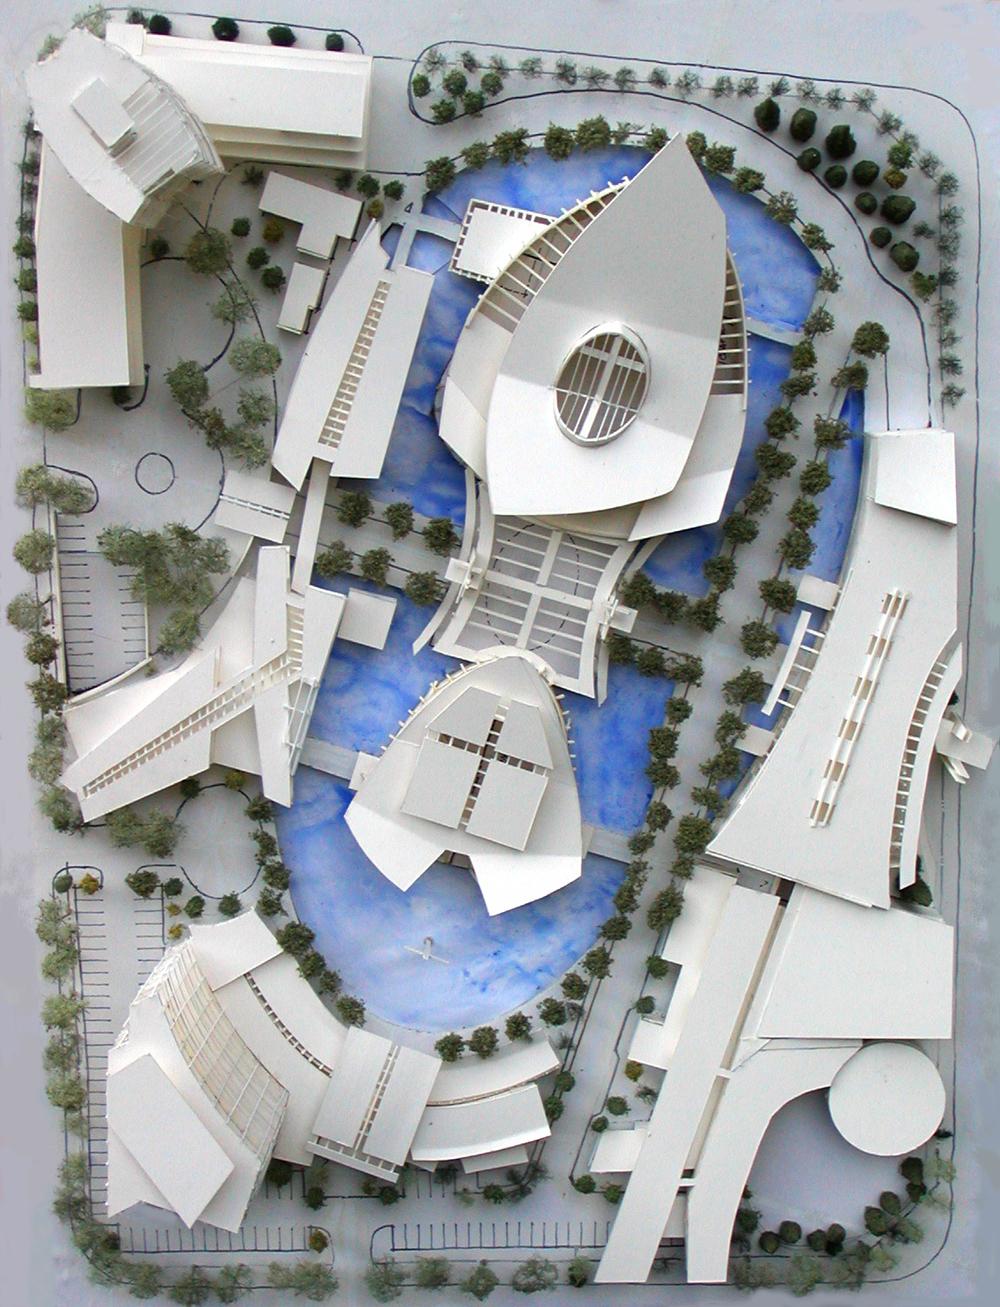 Aerial Model Plan View